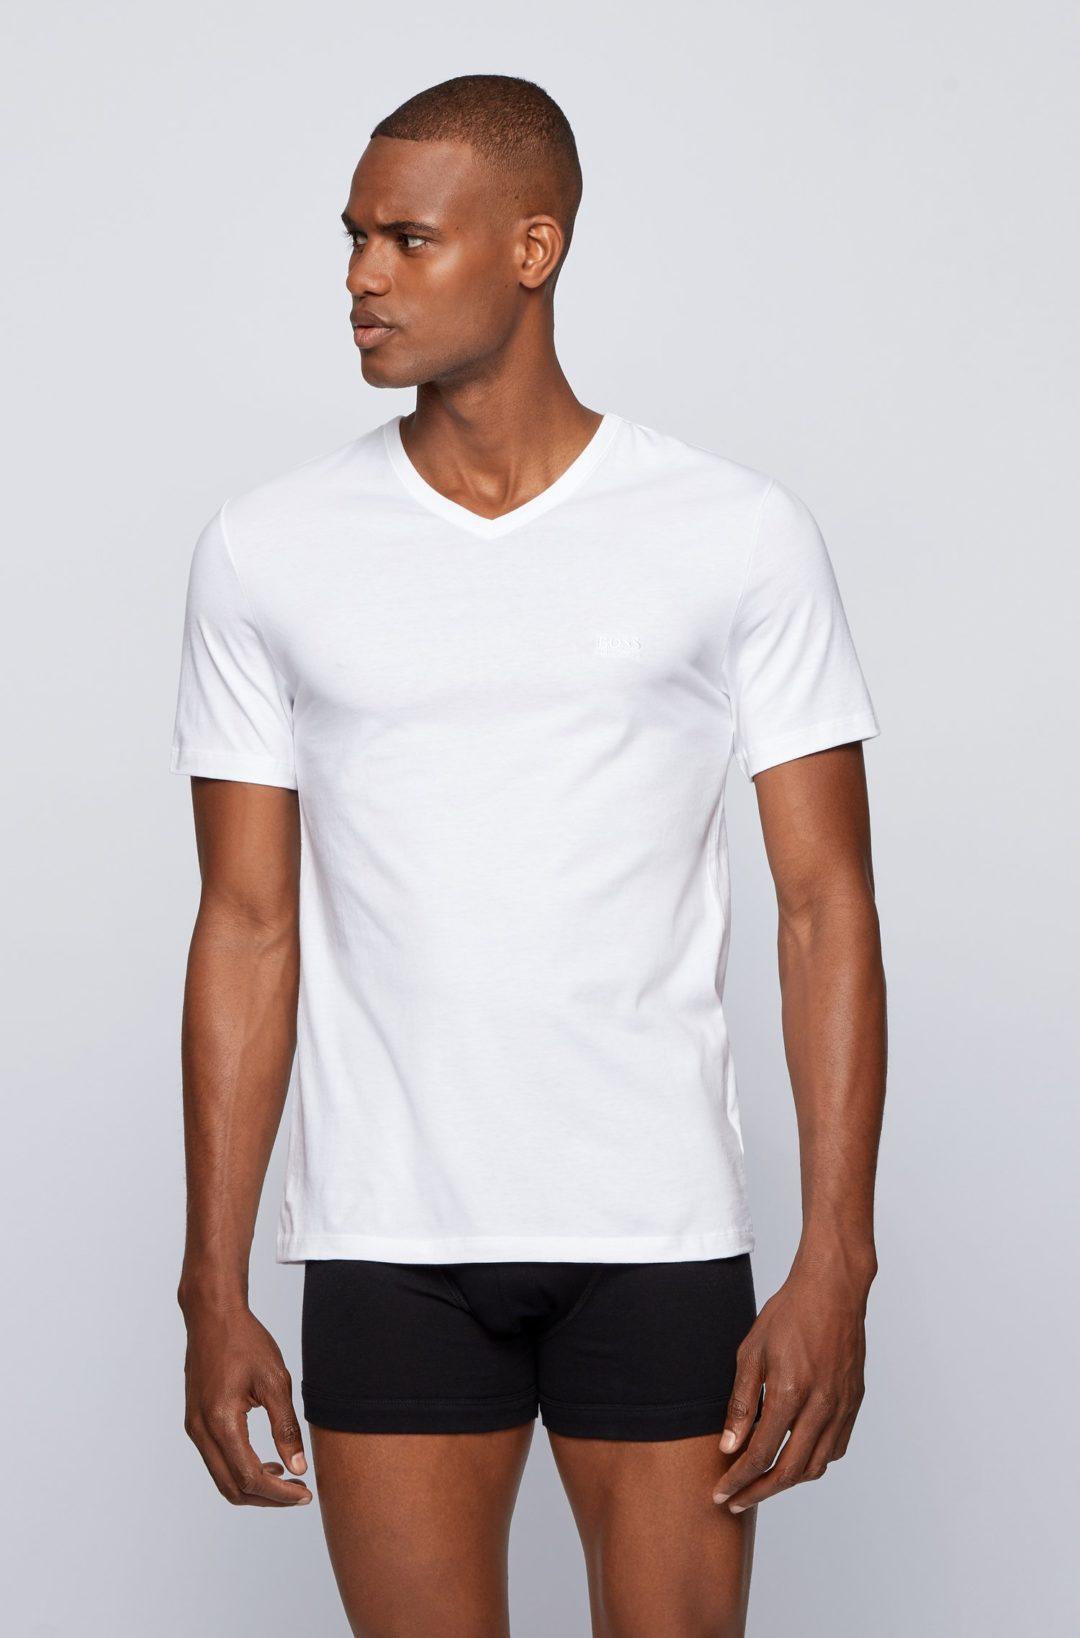 Hugo Boss - White Three-pack of V-neck underwear T-shirts in cotton